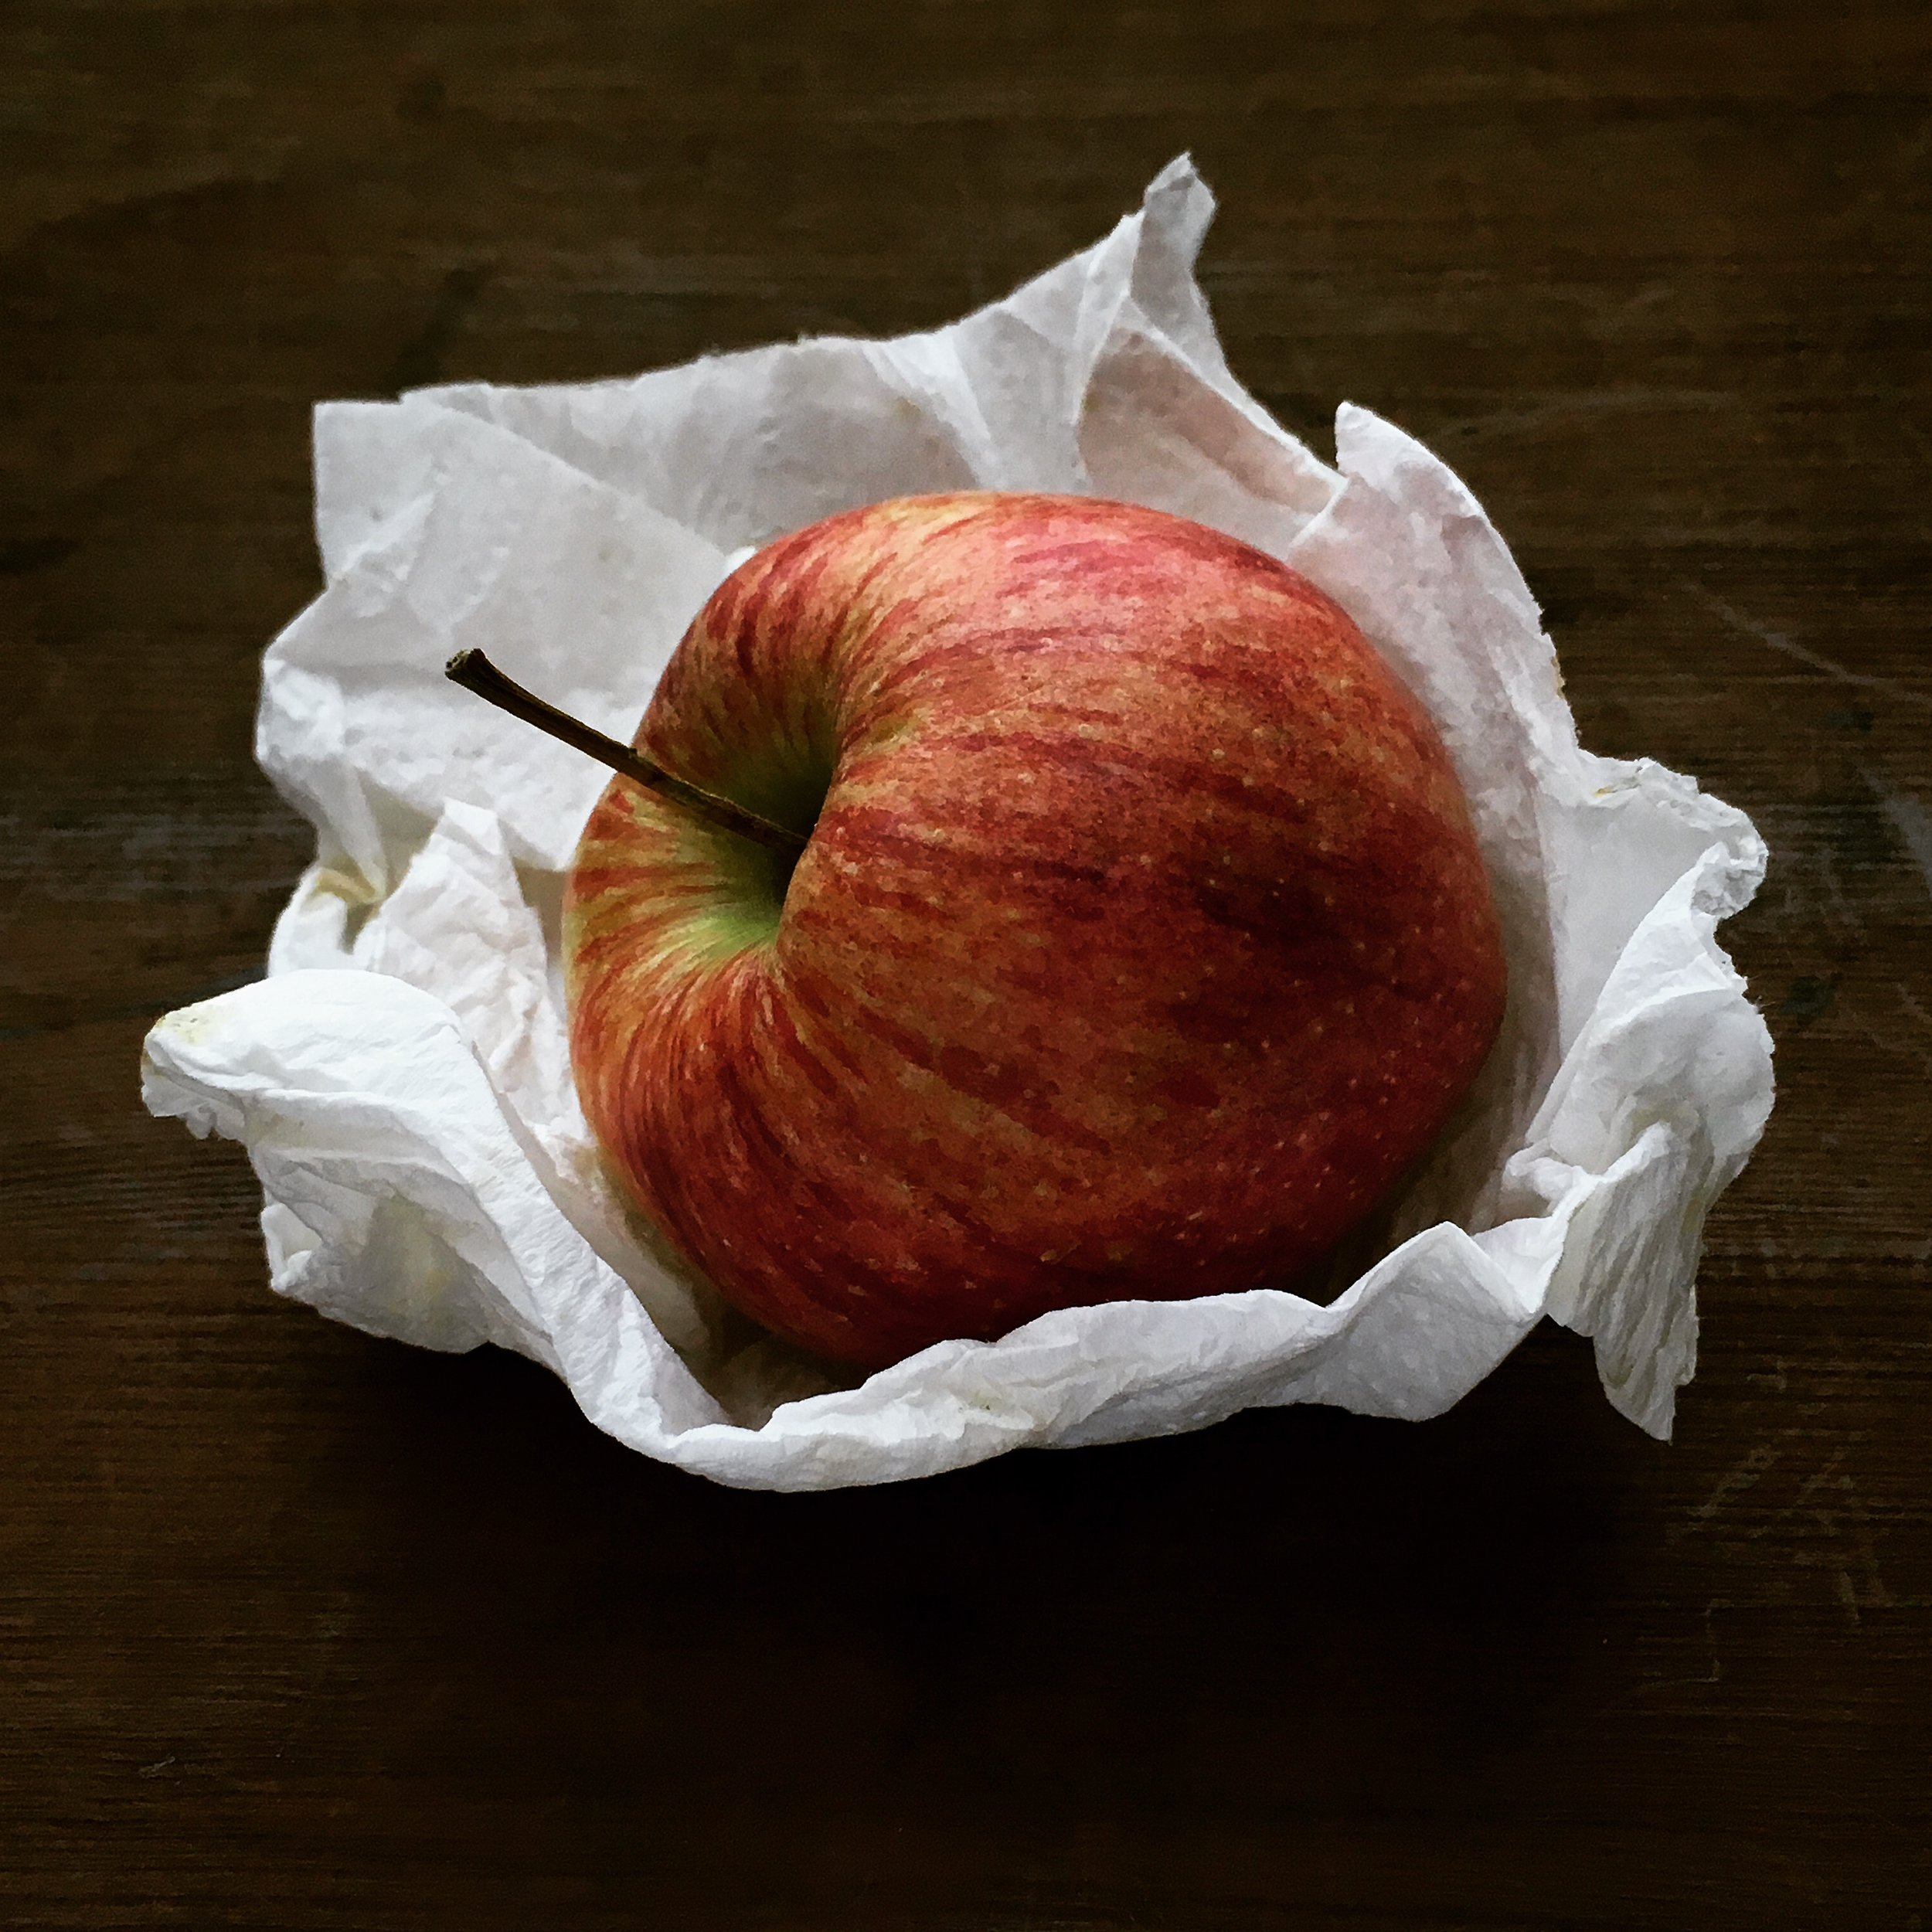 Gala apple, 2017